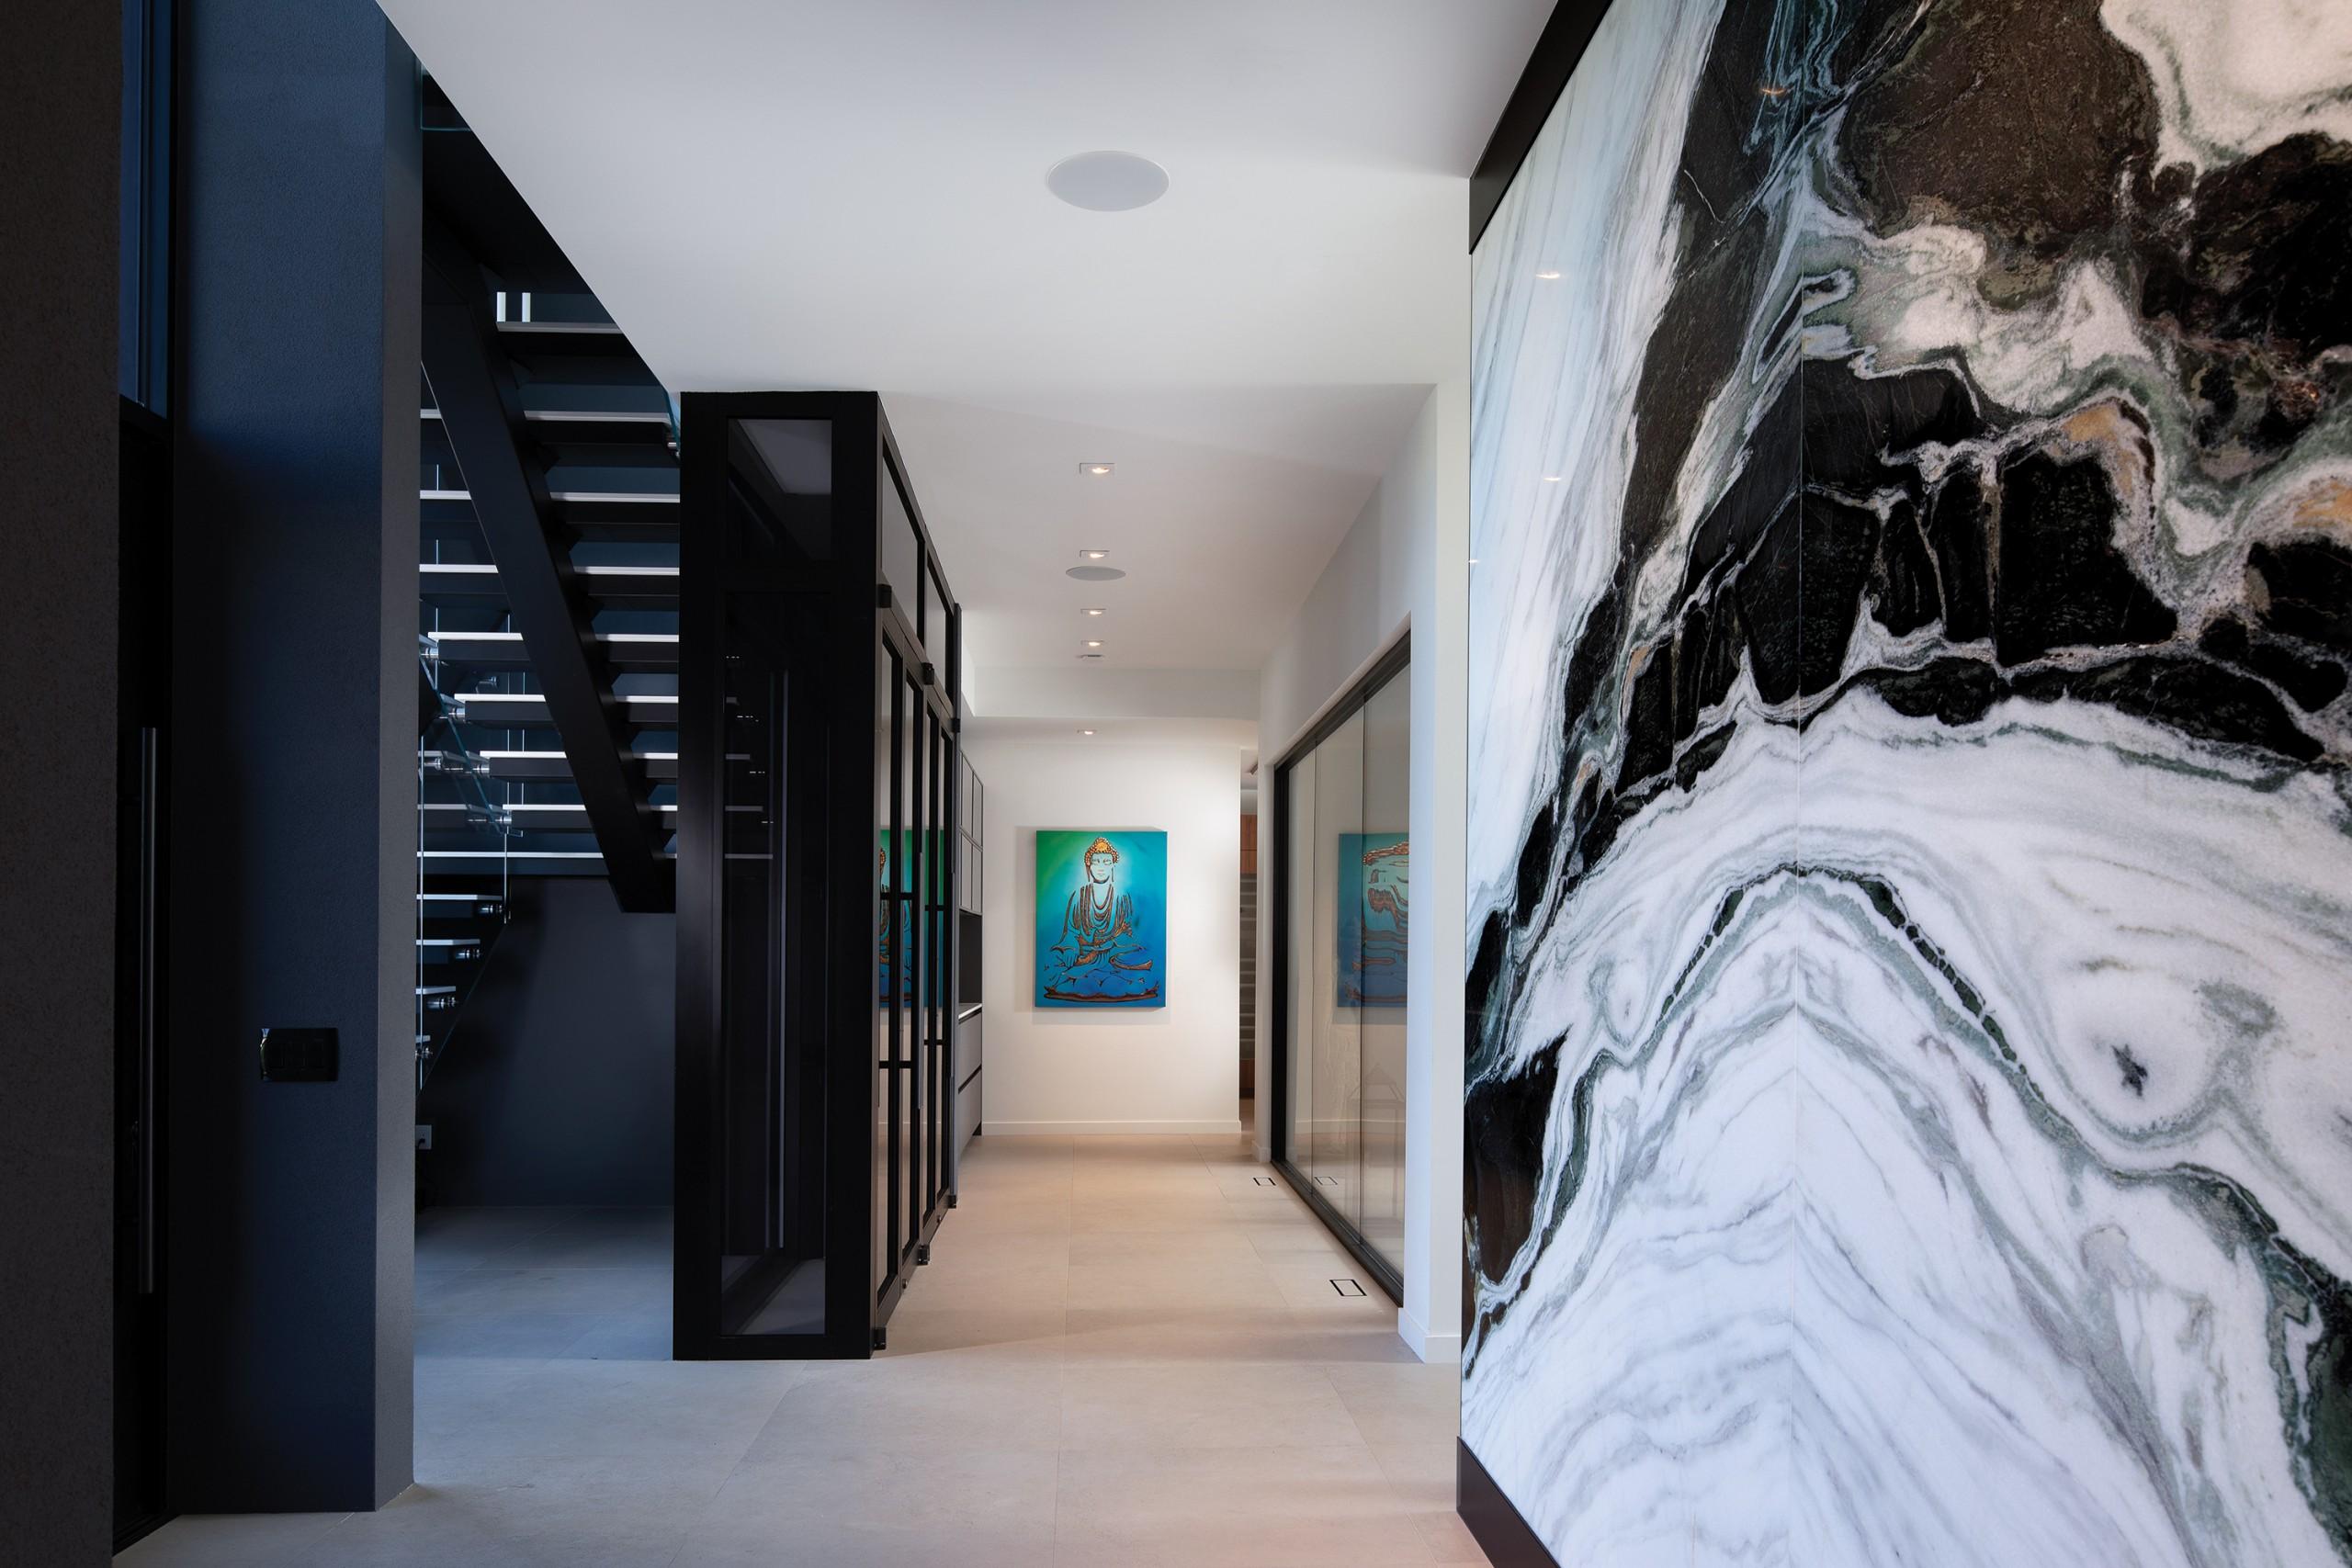 09 21 Hhr Feature Home Bella Pietra2